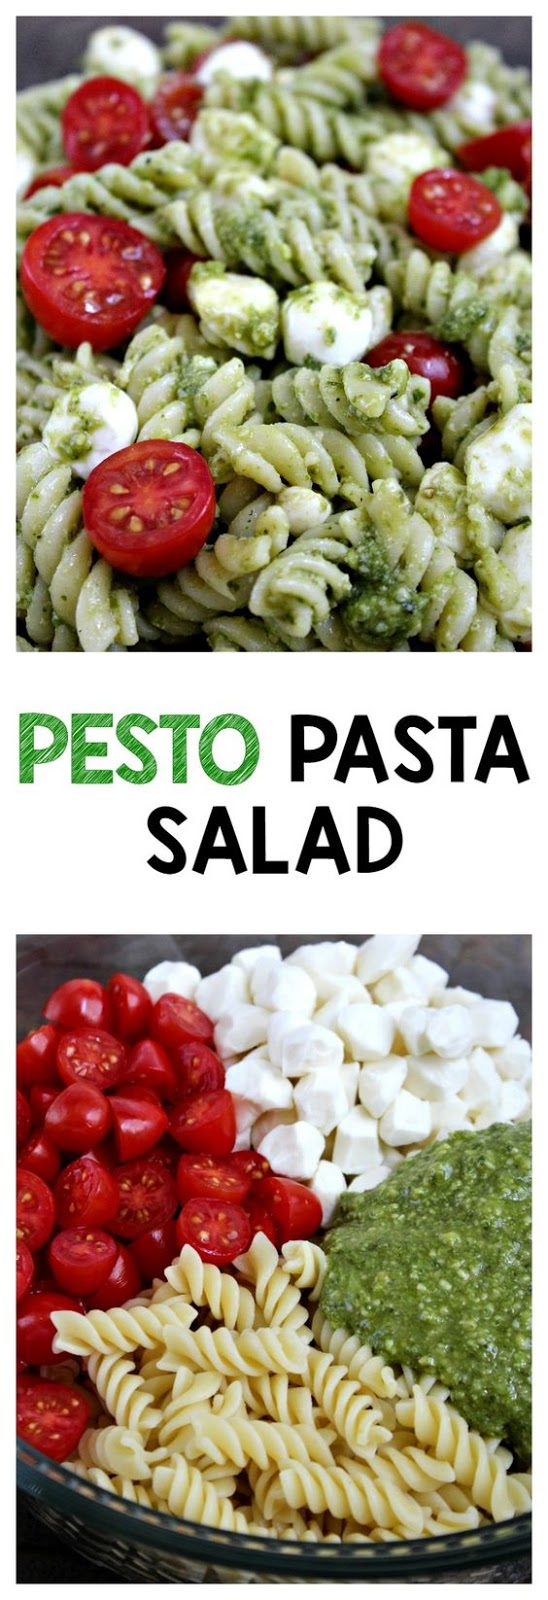 #Easy #Making #Pesto #Pasta #Salad For #Meals #vegan #healthyrecipes #pasta